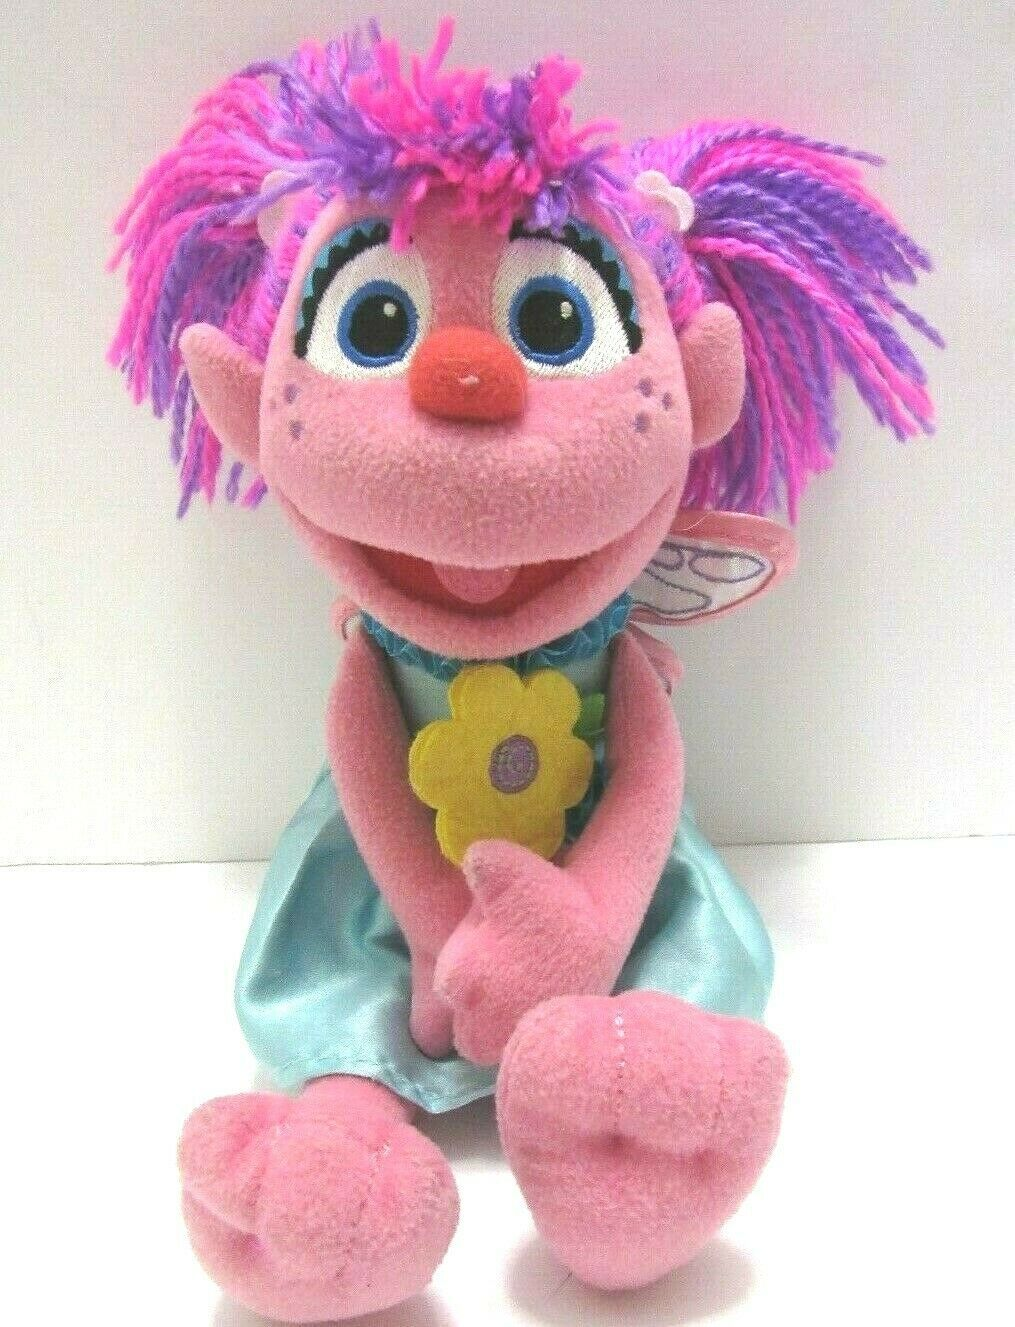 "Gund Sesame Street Abby Cadabby Fairy Plush Stuffed Doll Plushie Muppet 11"" 2014 - $30.68"